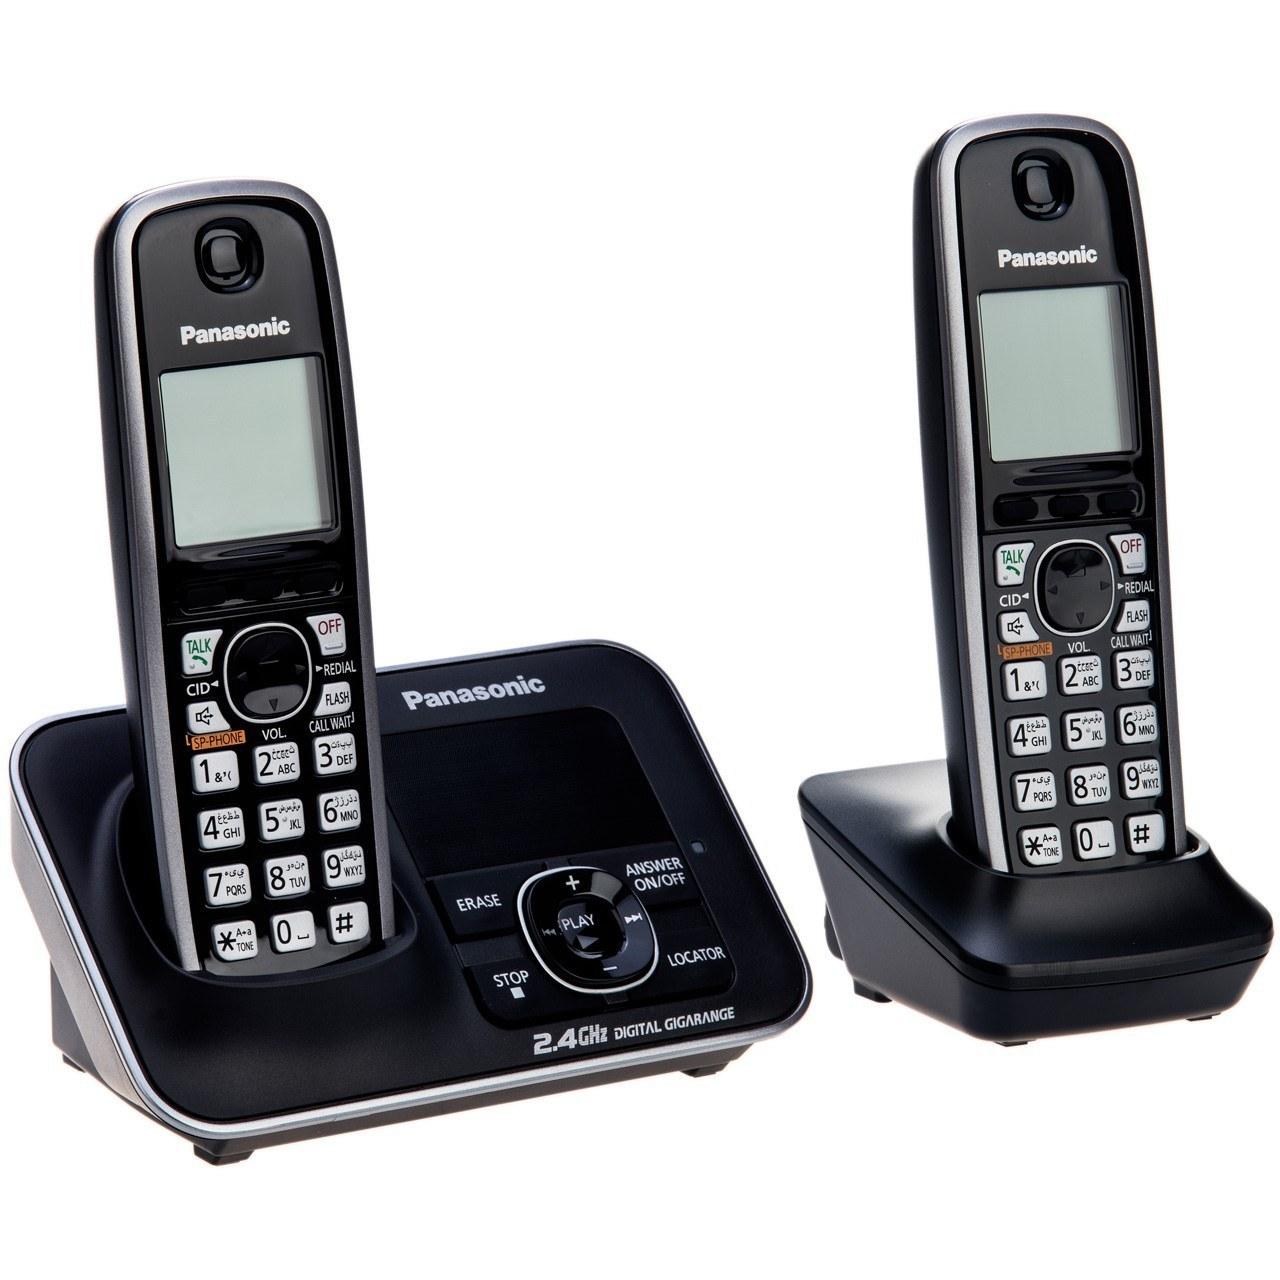 تصویر گوشی تلفن  بی سیم  پاناسونیک Panasonic Cordless Telephone KX-TG3722